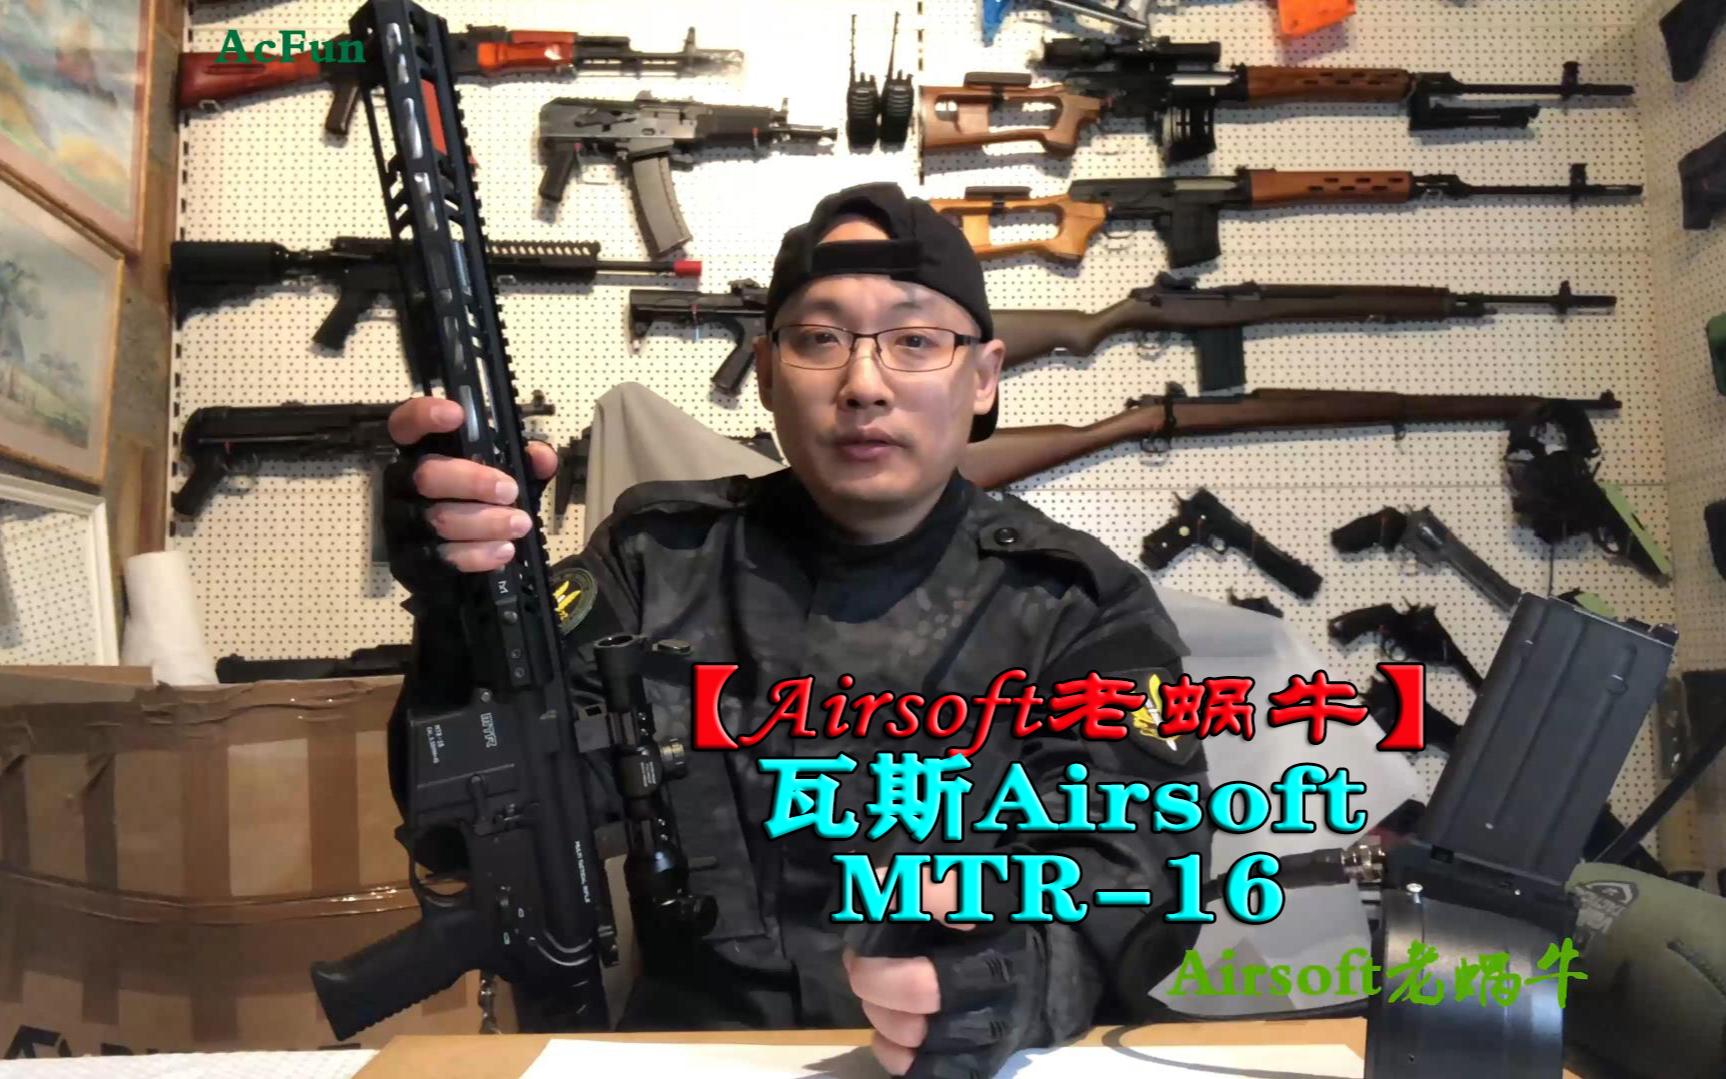 【Airsoft老蜗牛】Wargame 瓦斯 Airsoft MTR-16【拍摄于英国】